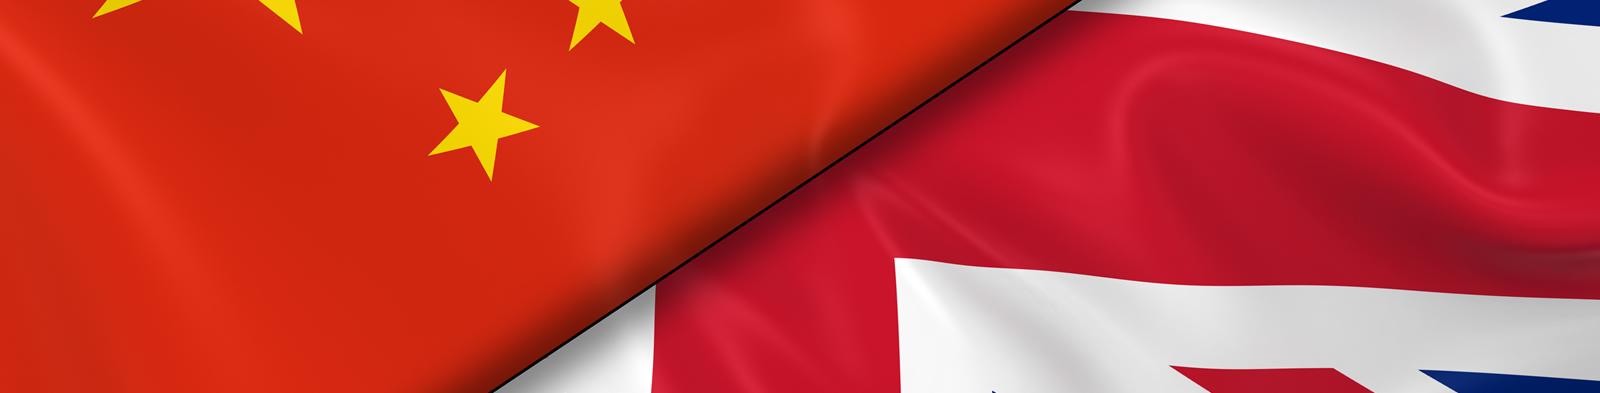 Flags of China and United Kingdom divided diagonally